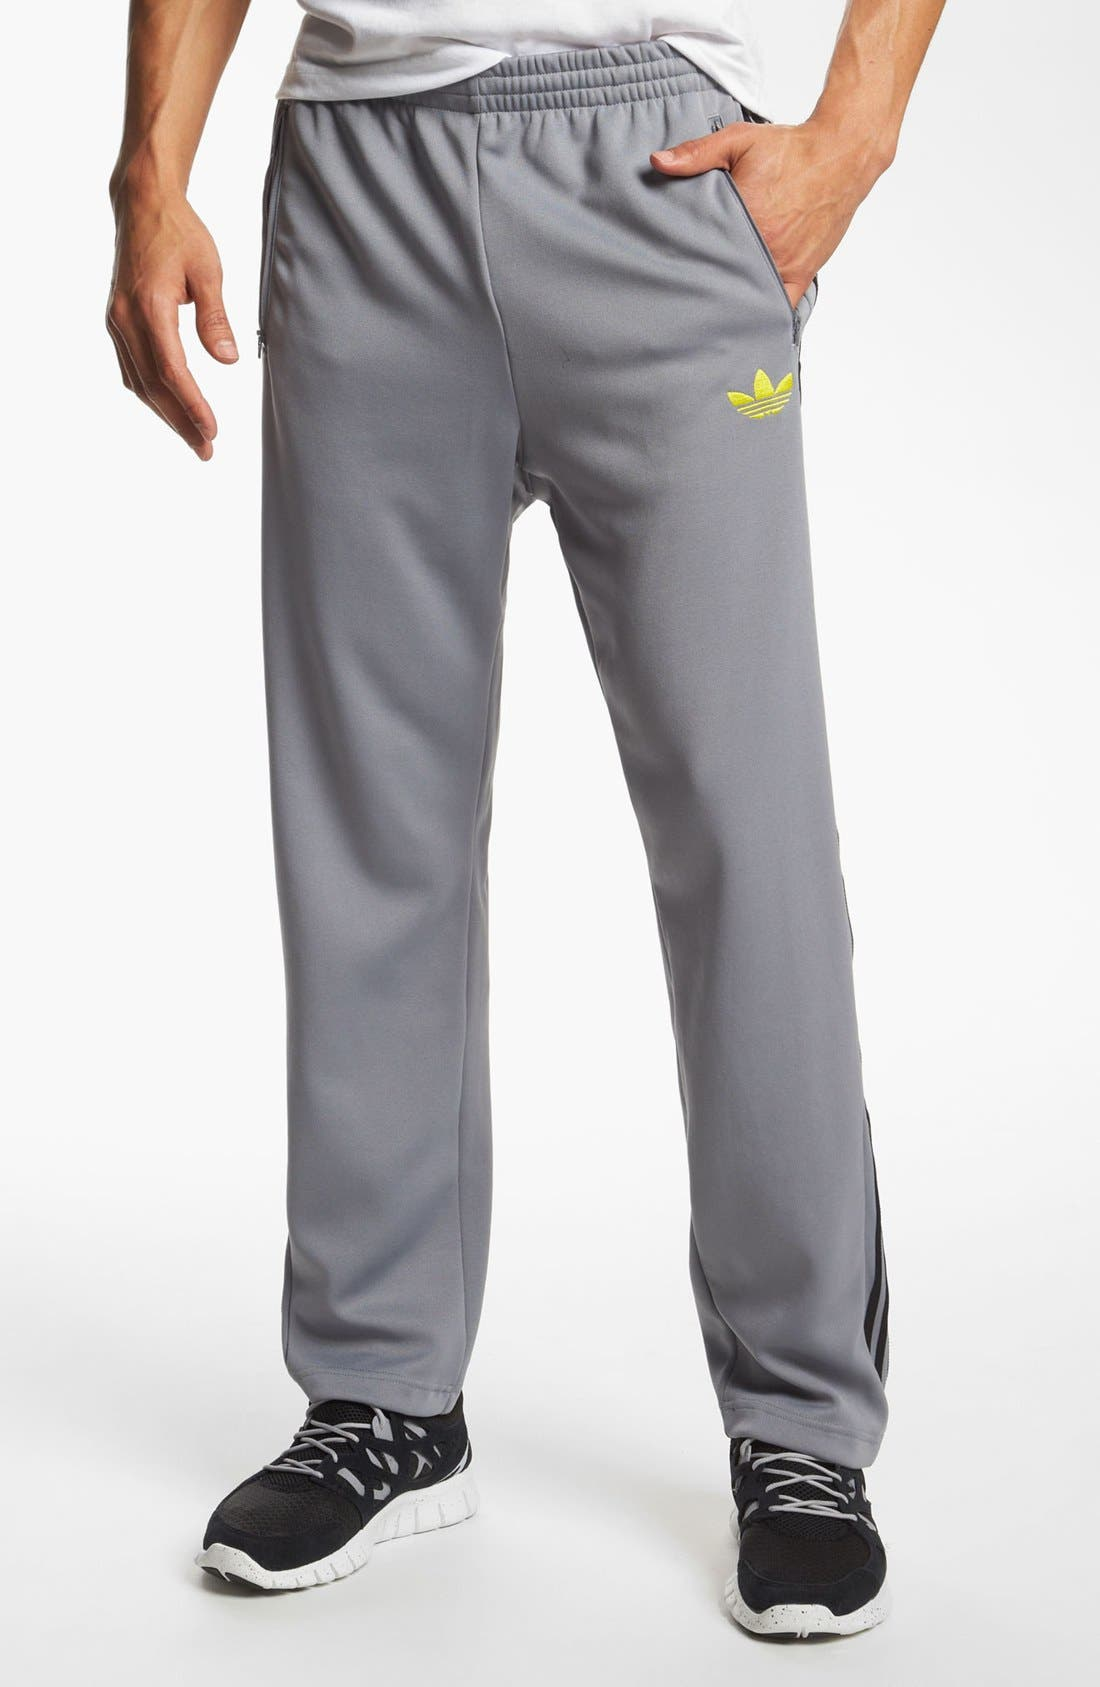 Alternate Image 1 Selected - adidas Originals 'adi-Icon' Pants